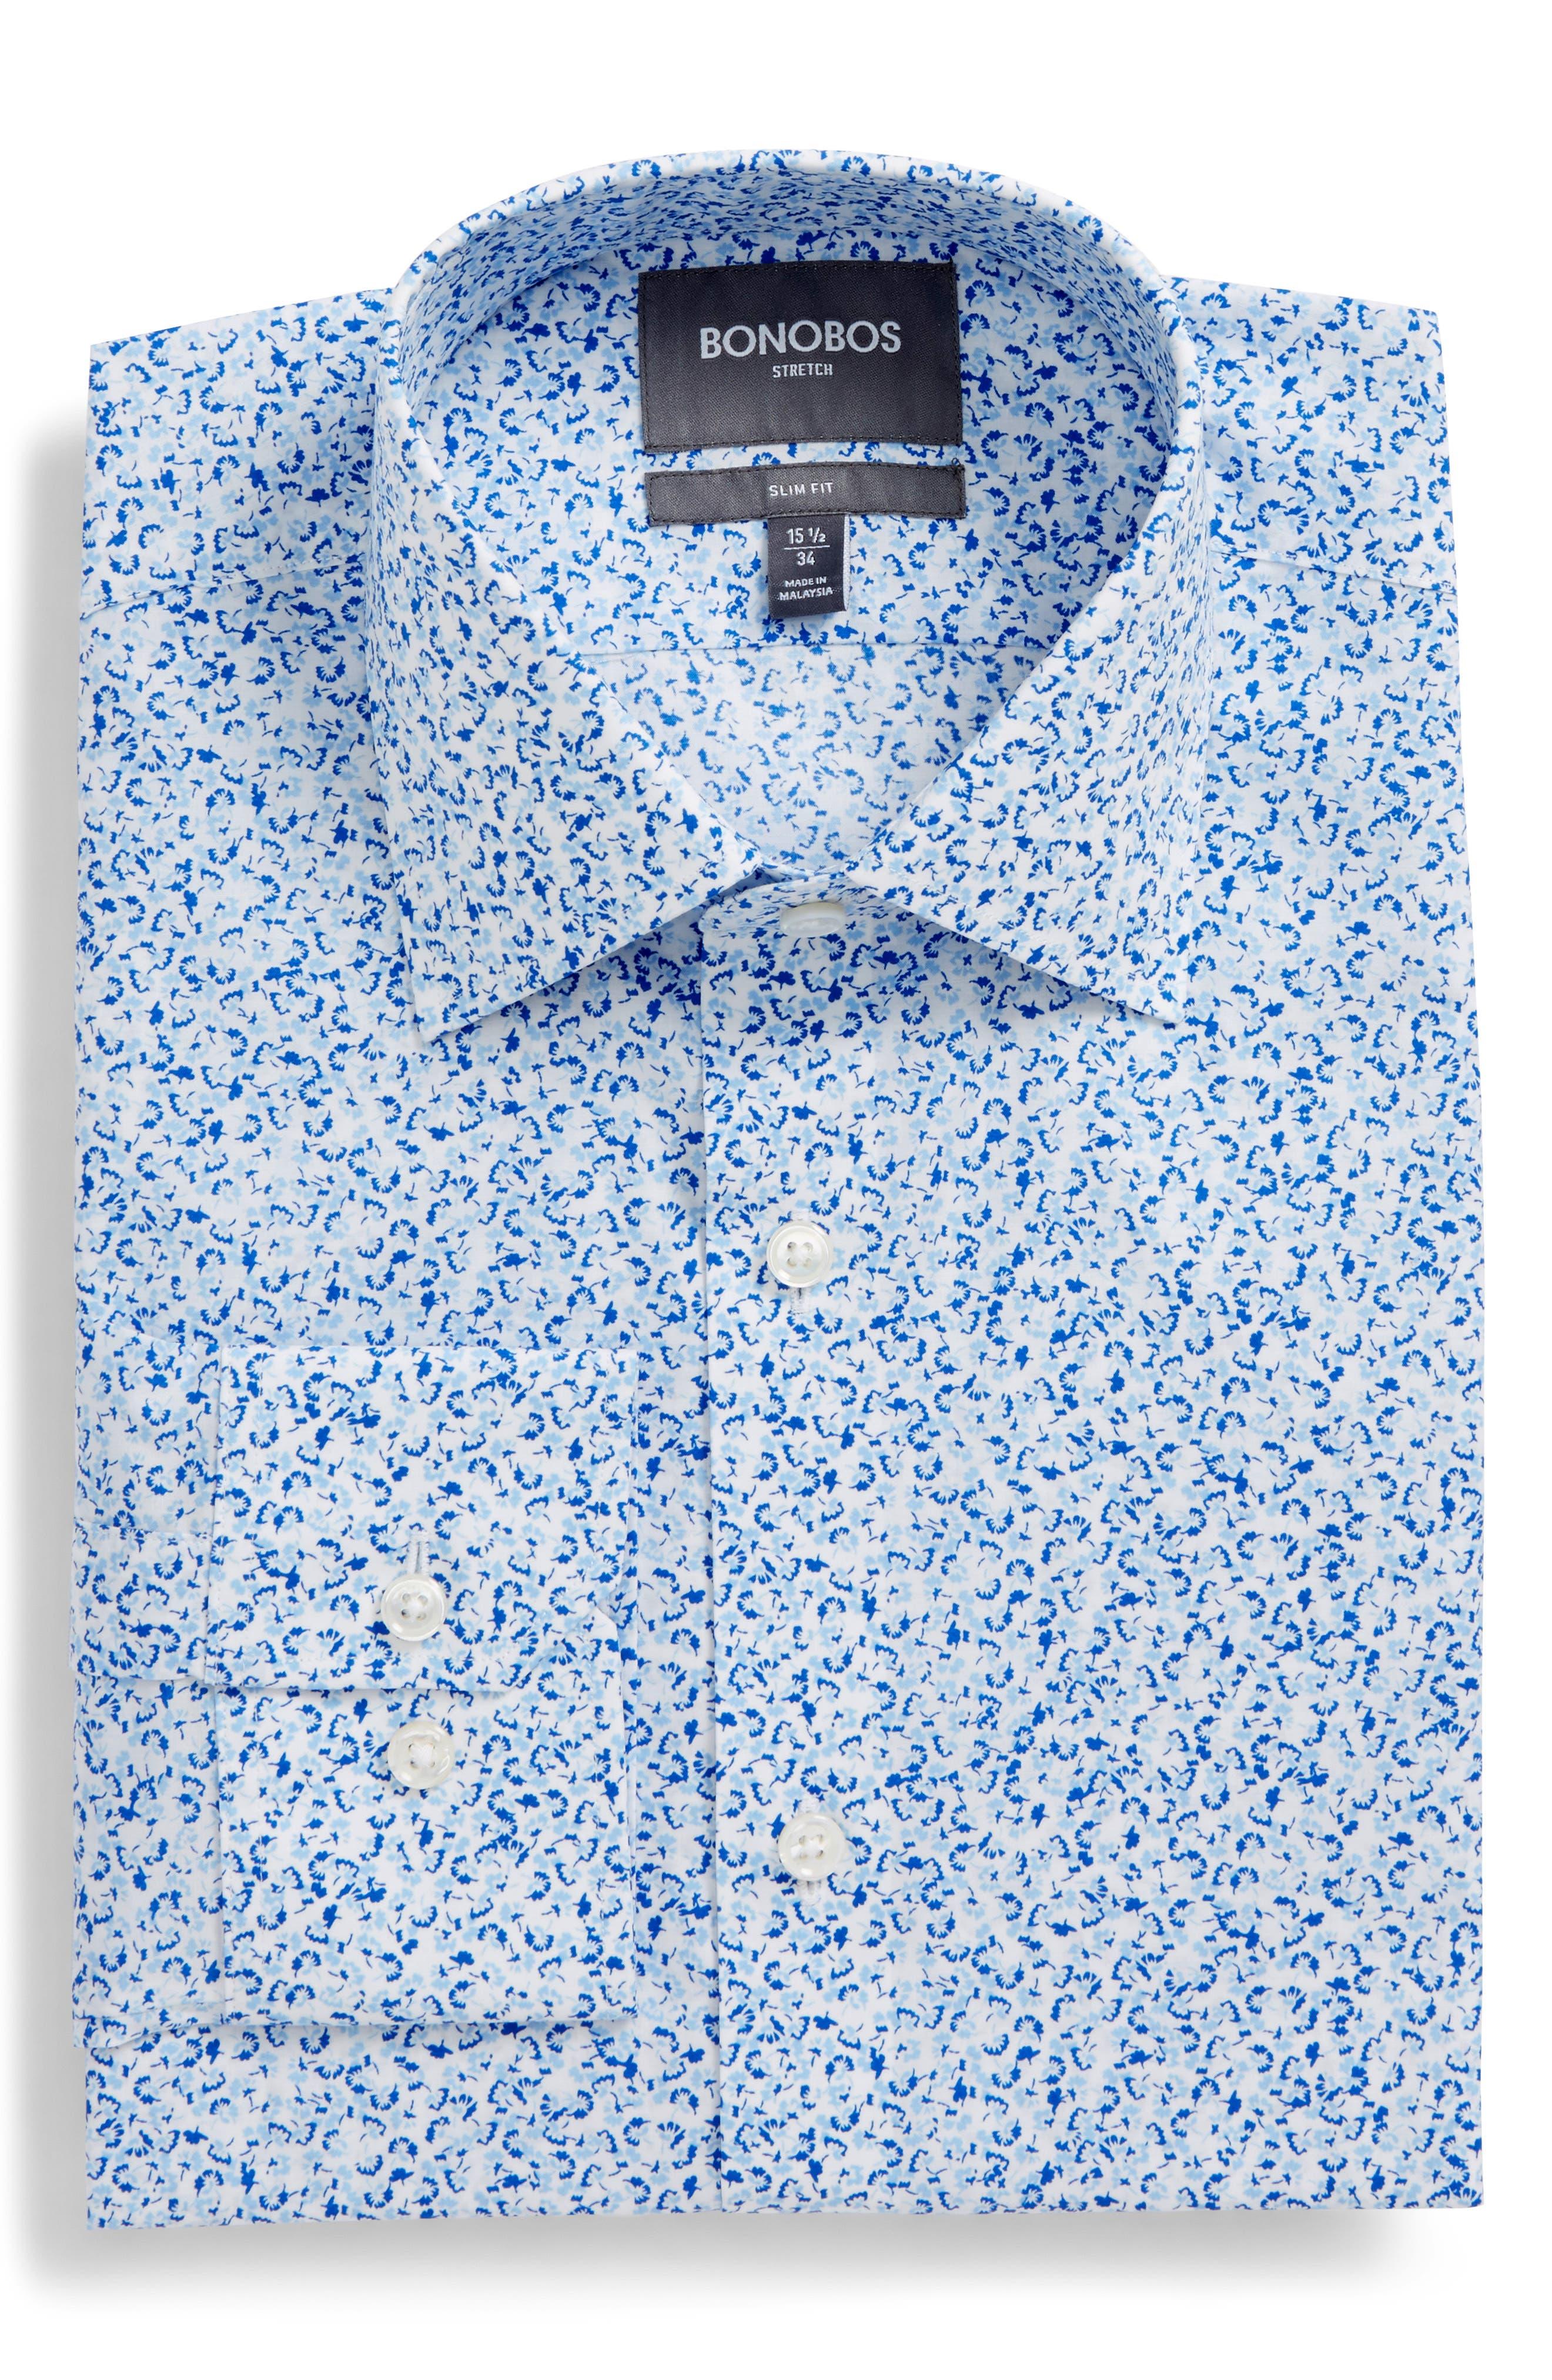 Jetsetter Slim Fit Floral Dress Shirt,                             Alternate thumbnail 6, color,                             Lapis Blue